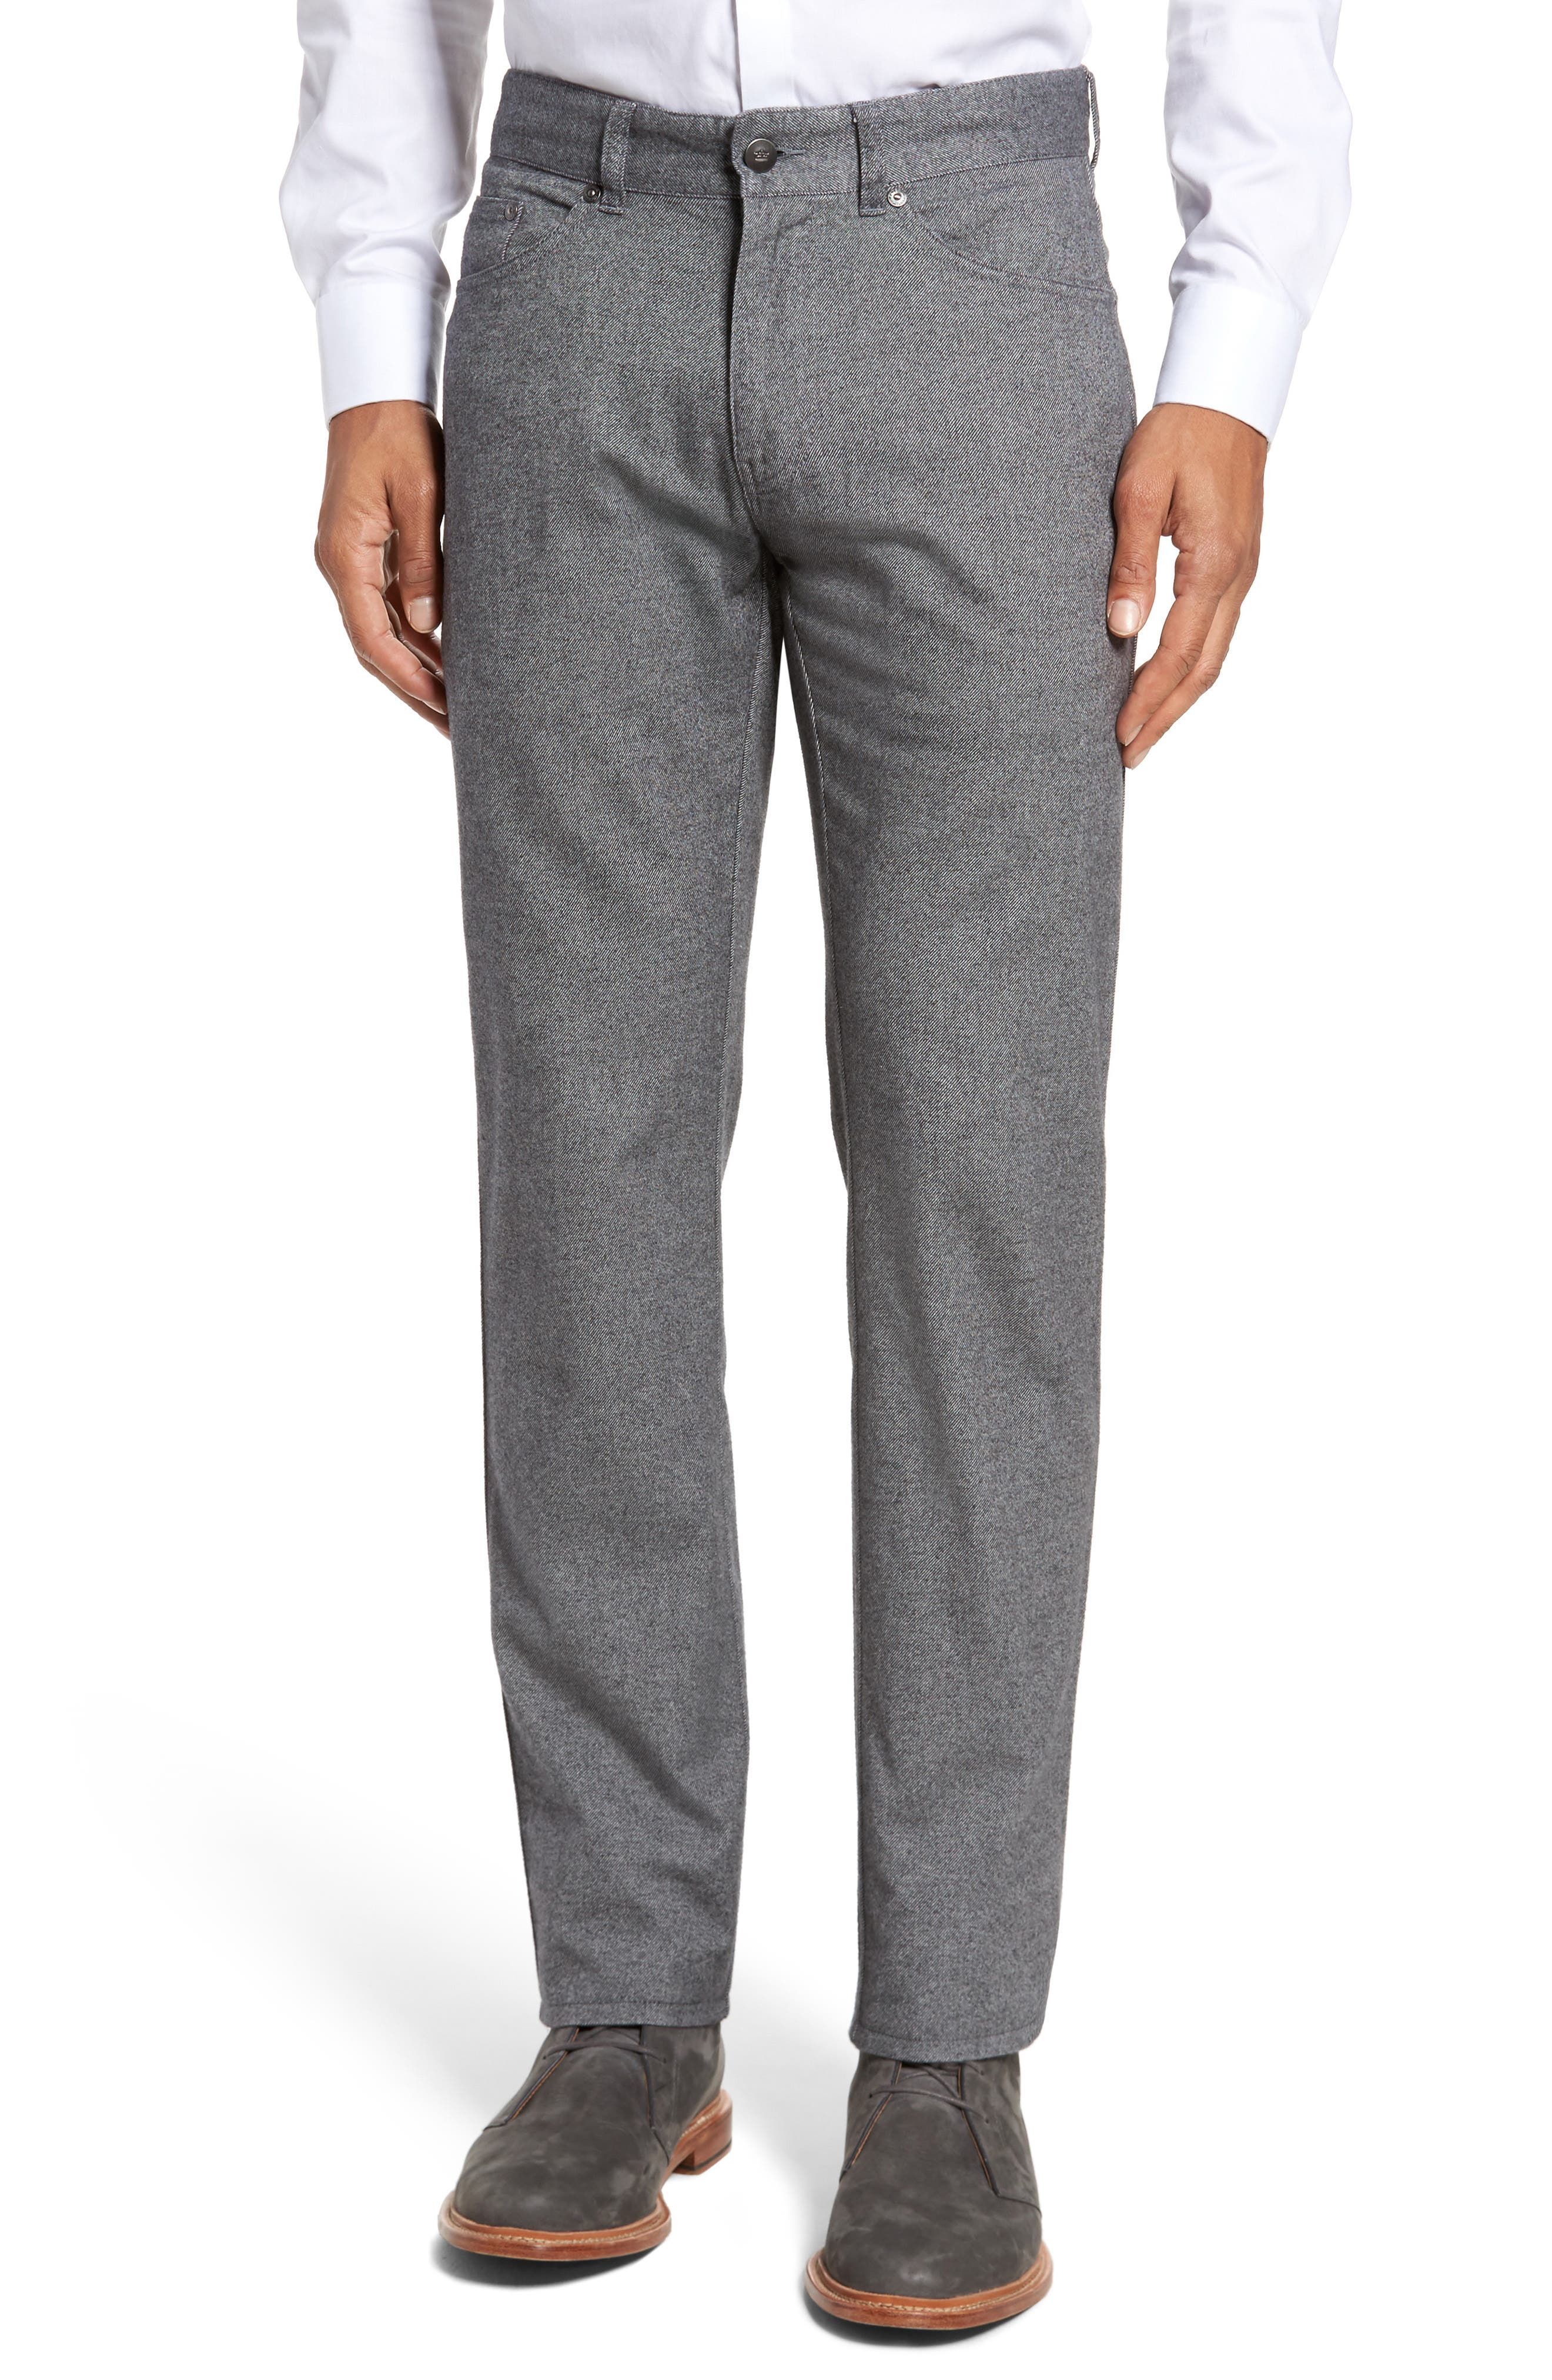 Mountainside Flannel Five-Pocket Pants,                             Main thumbnail 1, color,                             033